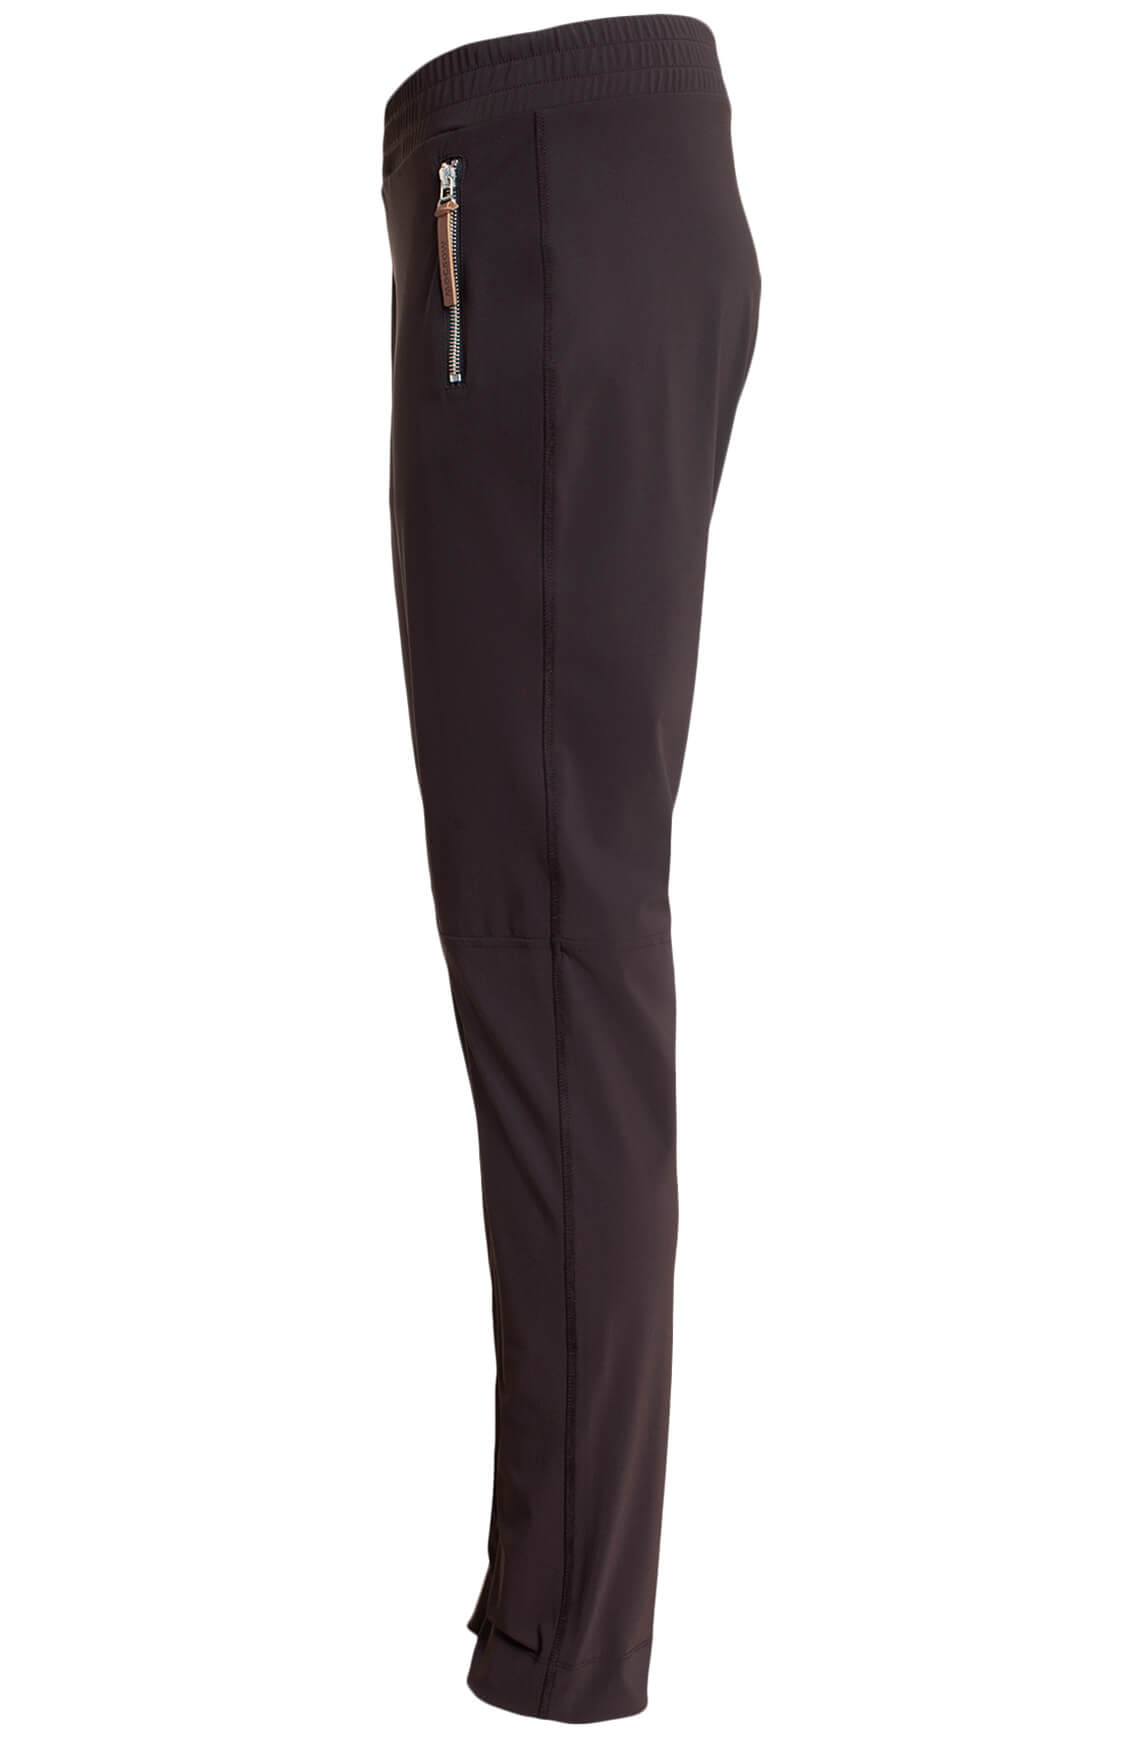 Moscow Dames Gilla jogging pants Bruin